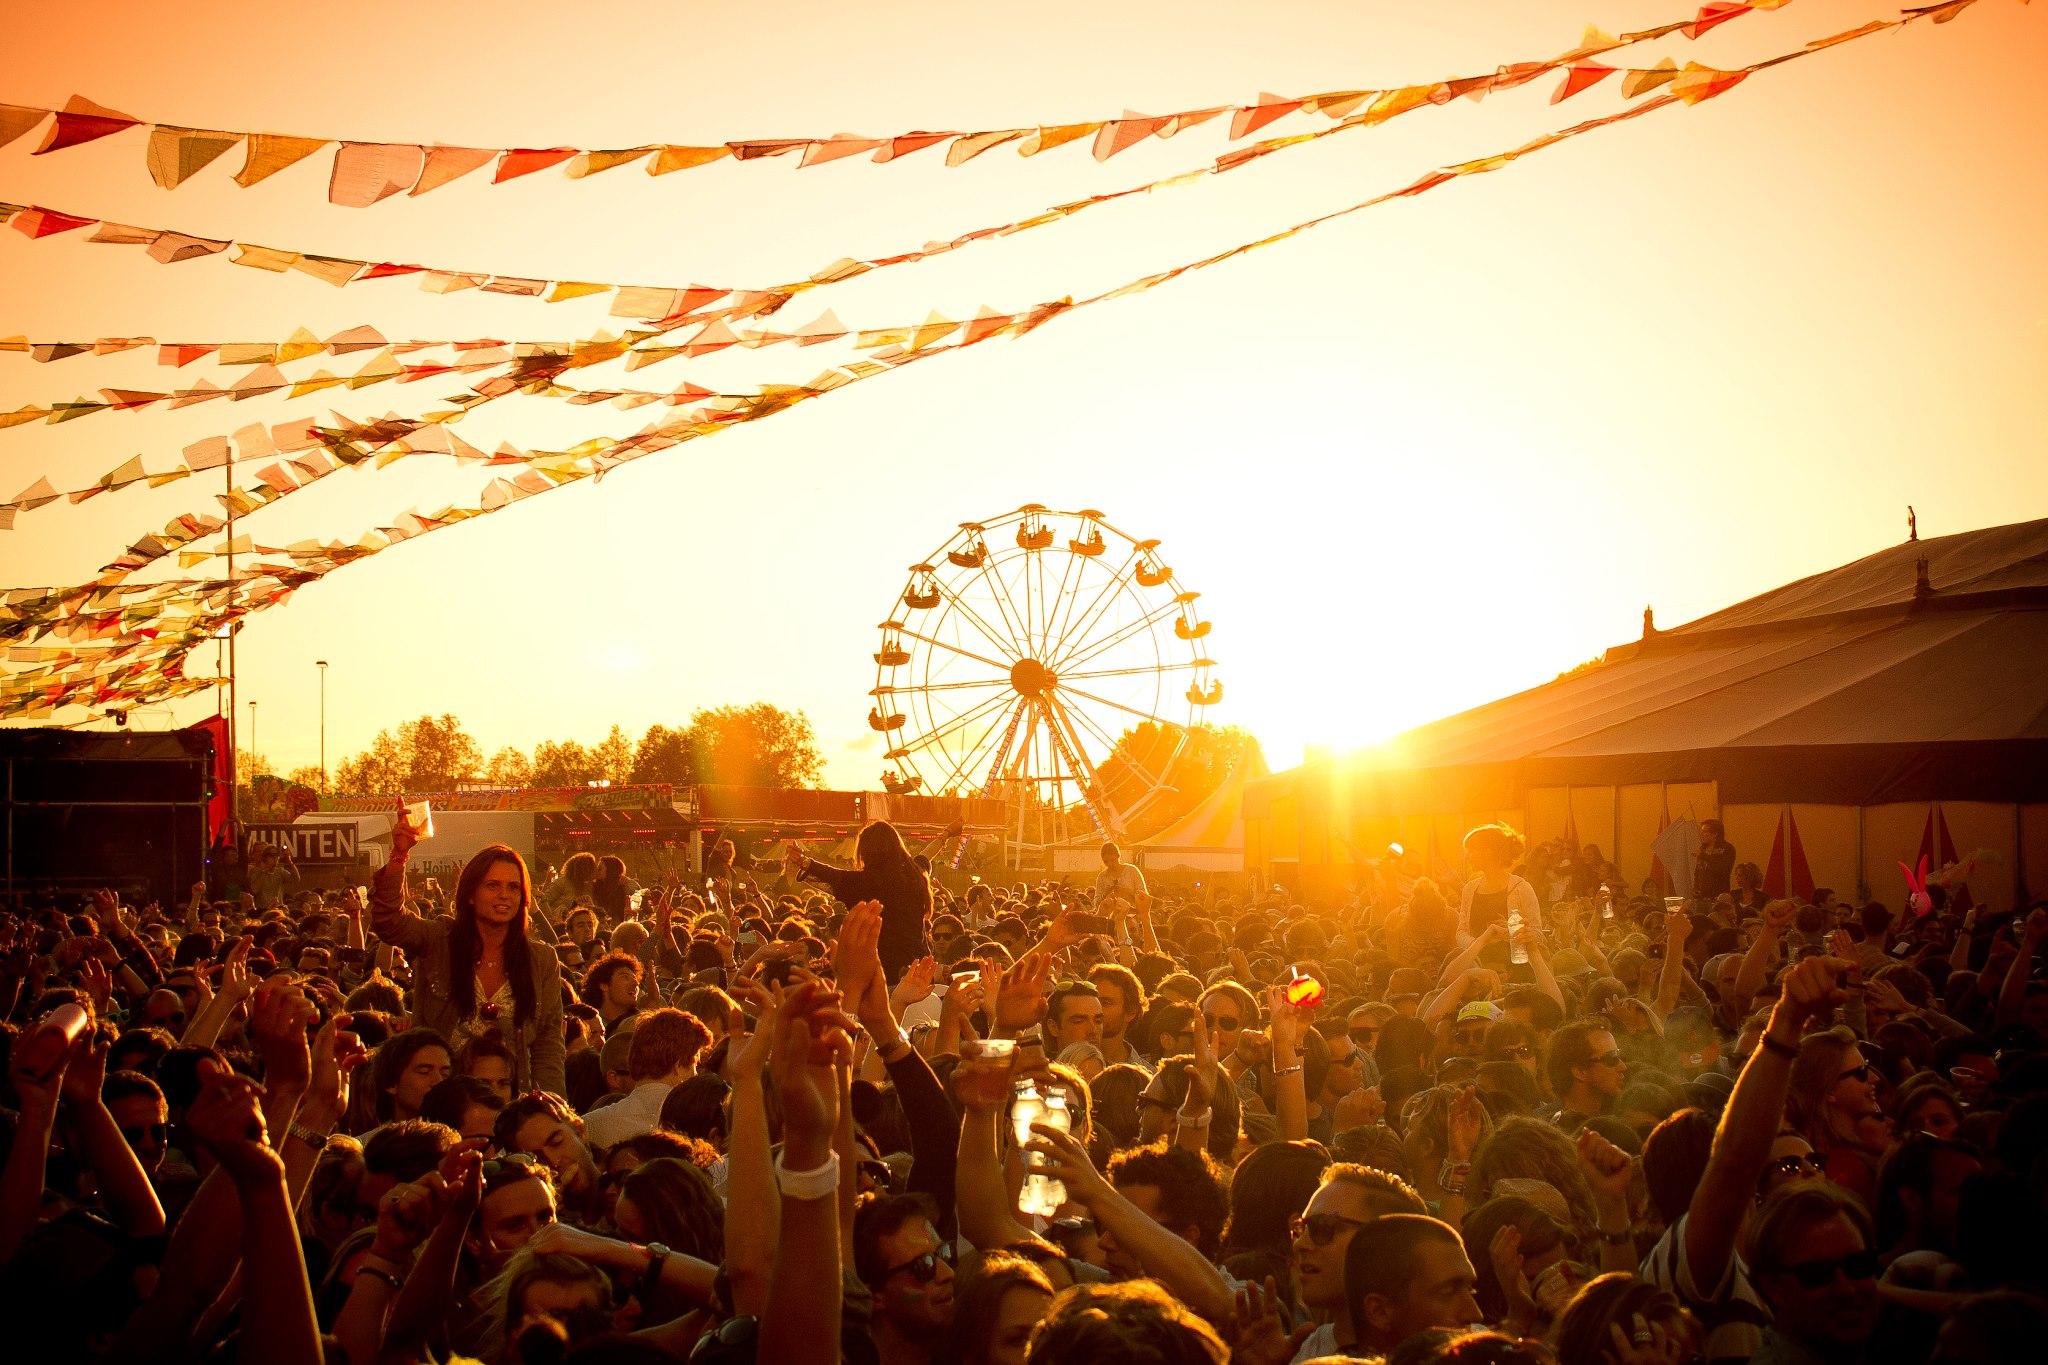 Festival zonnig